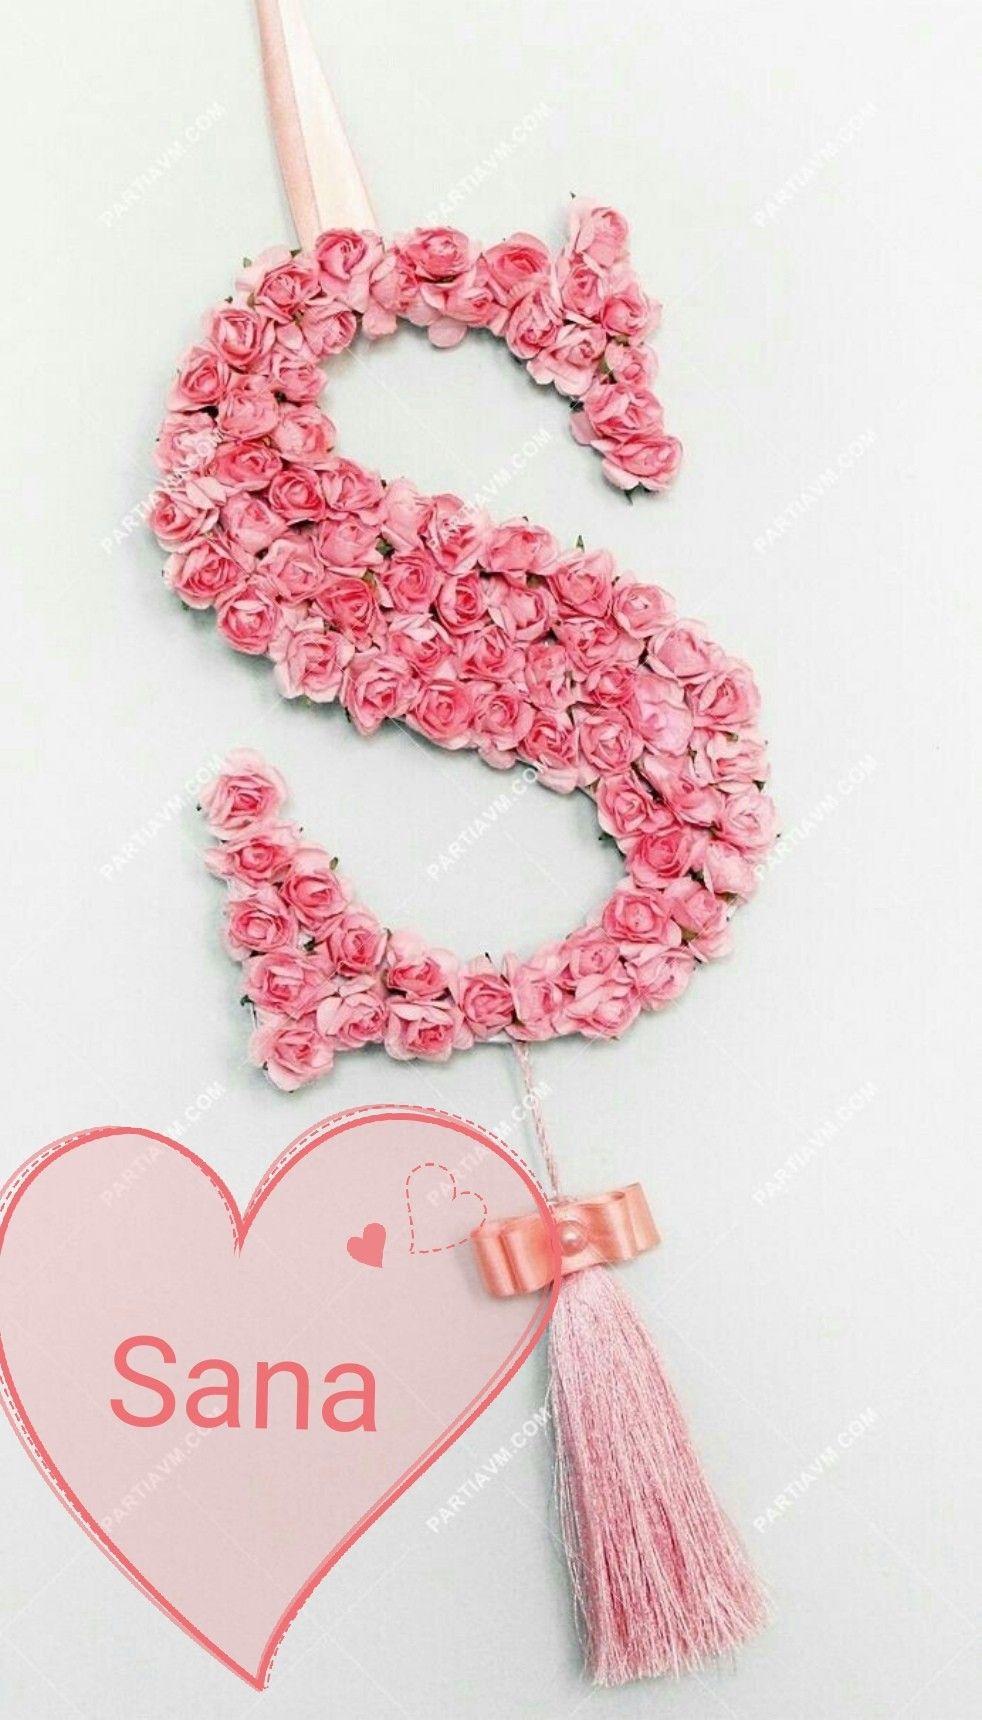 Pin By Radmila Dojcinovic On Diy Floral Letters Flower Letters Stylish Alphabets